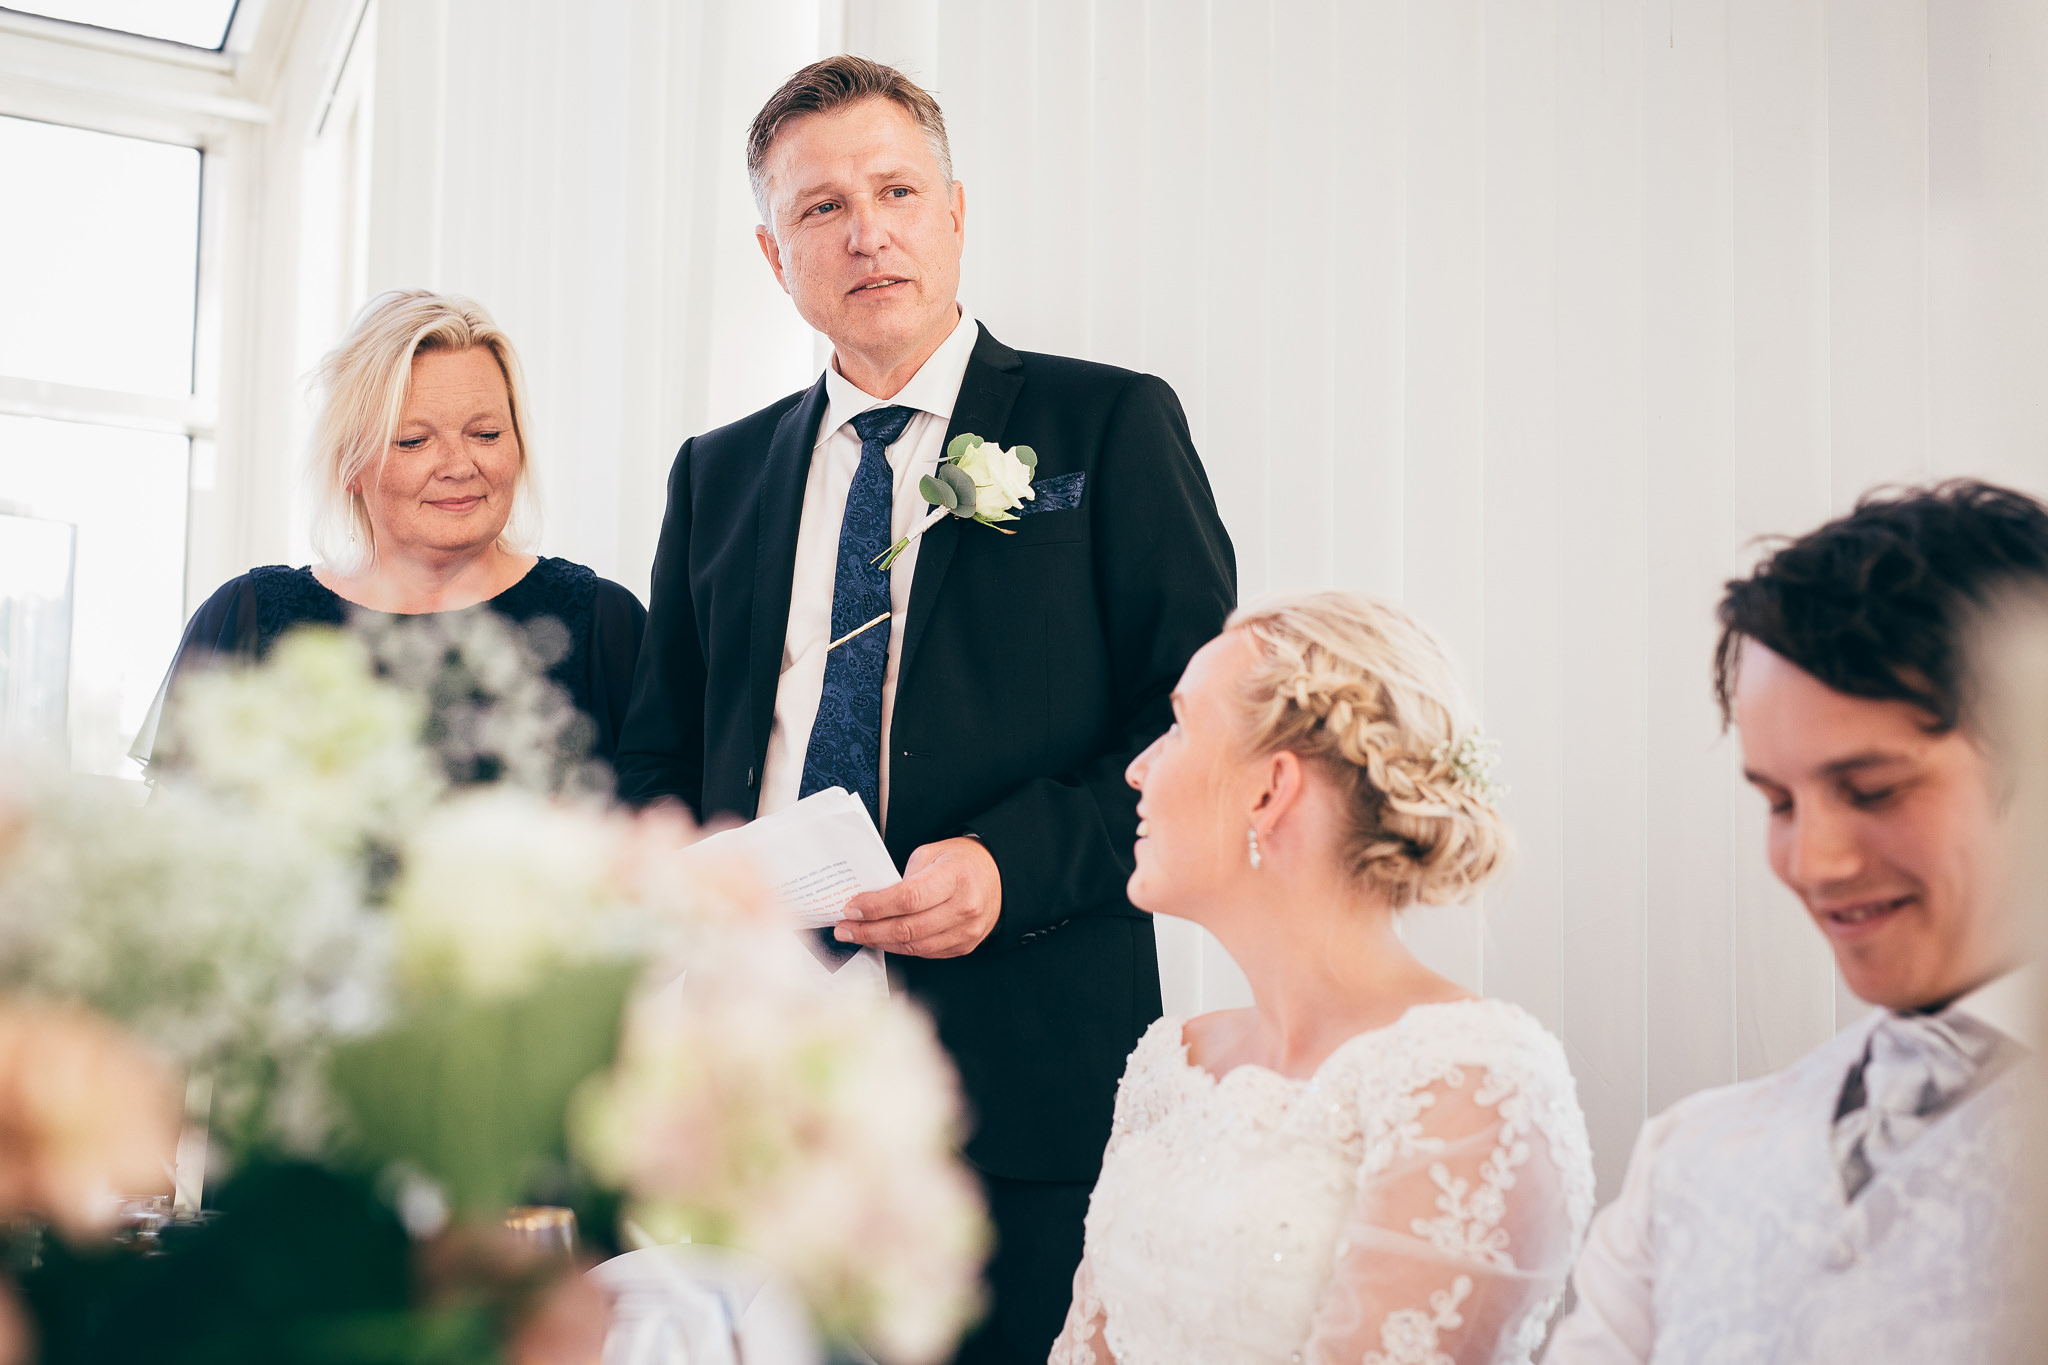 Wedding+Photographer+Norway+Bryllupsfotograf+Casey+Arneson+JT-156.jpg